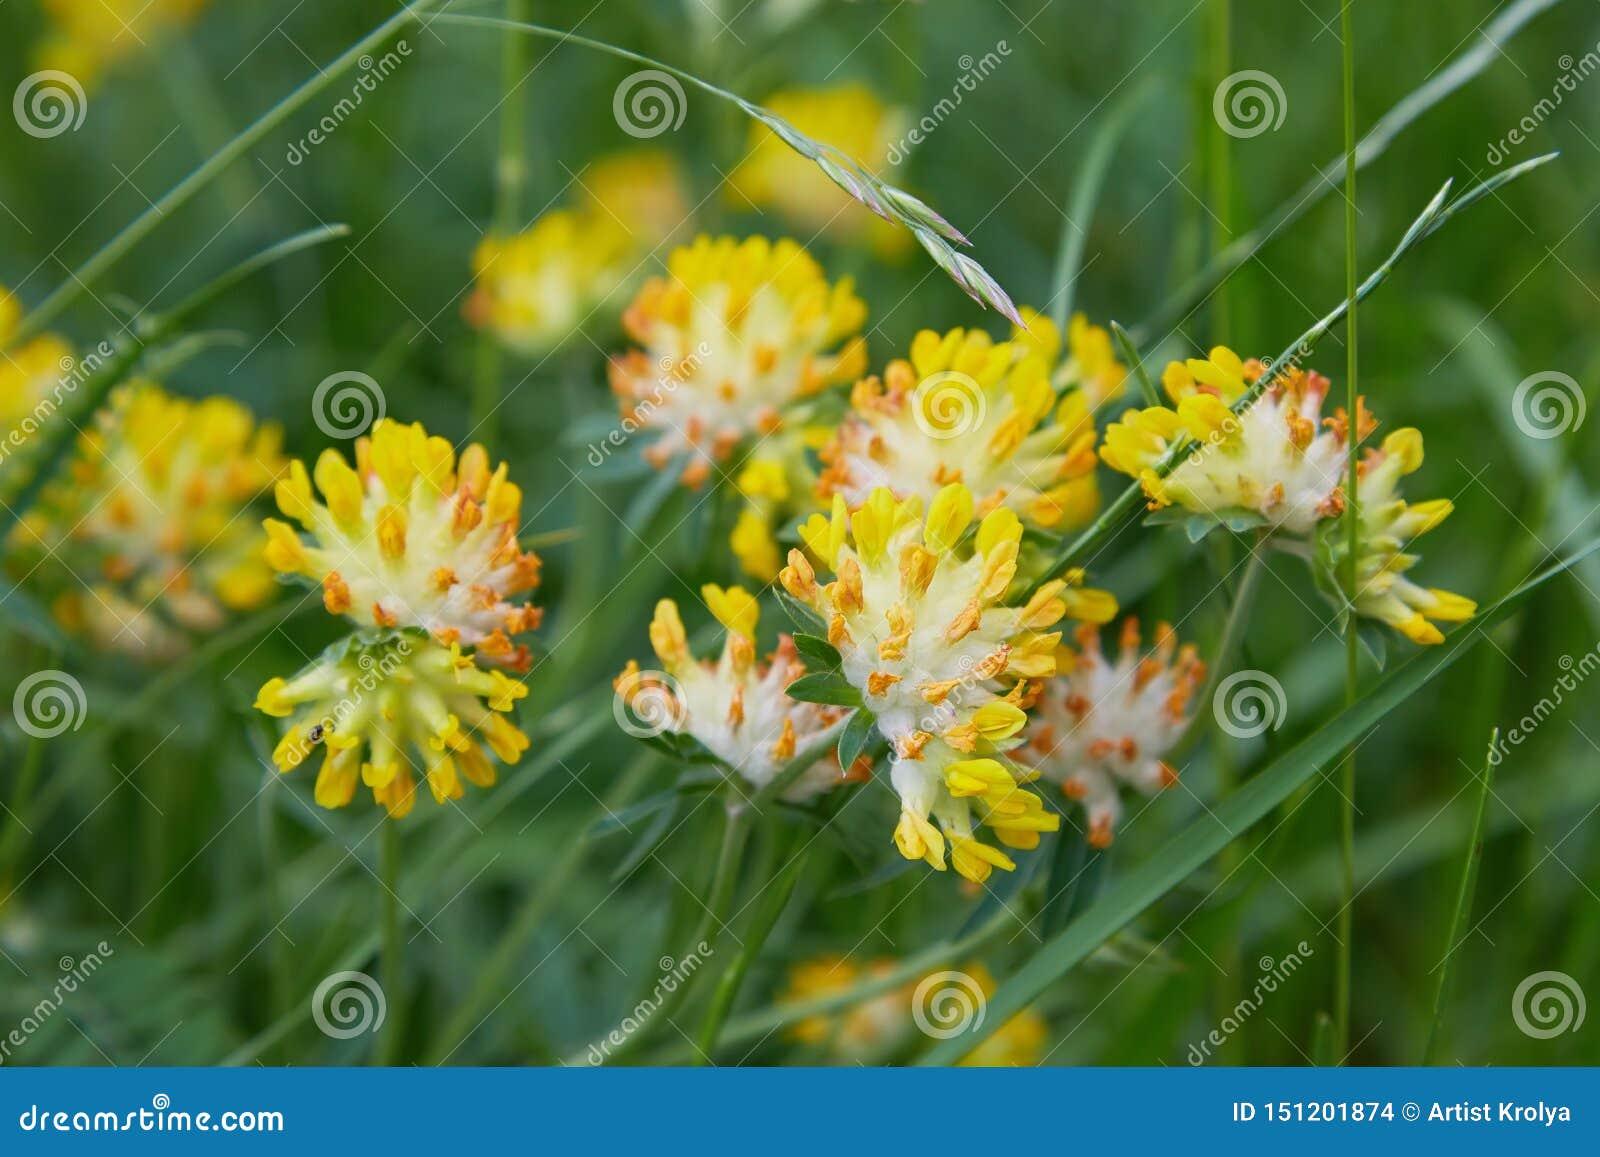 Sluit omhoog van Alpiene Nierwikke - Anthyllis-vulneraria